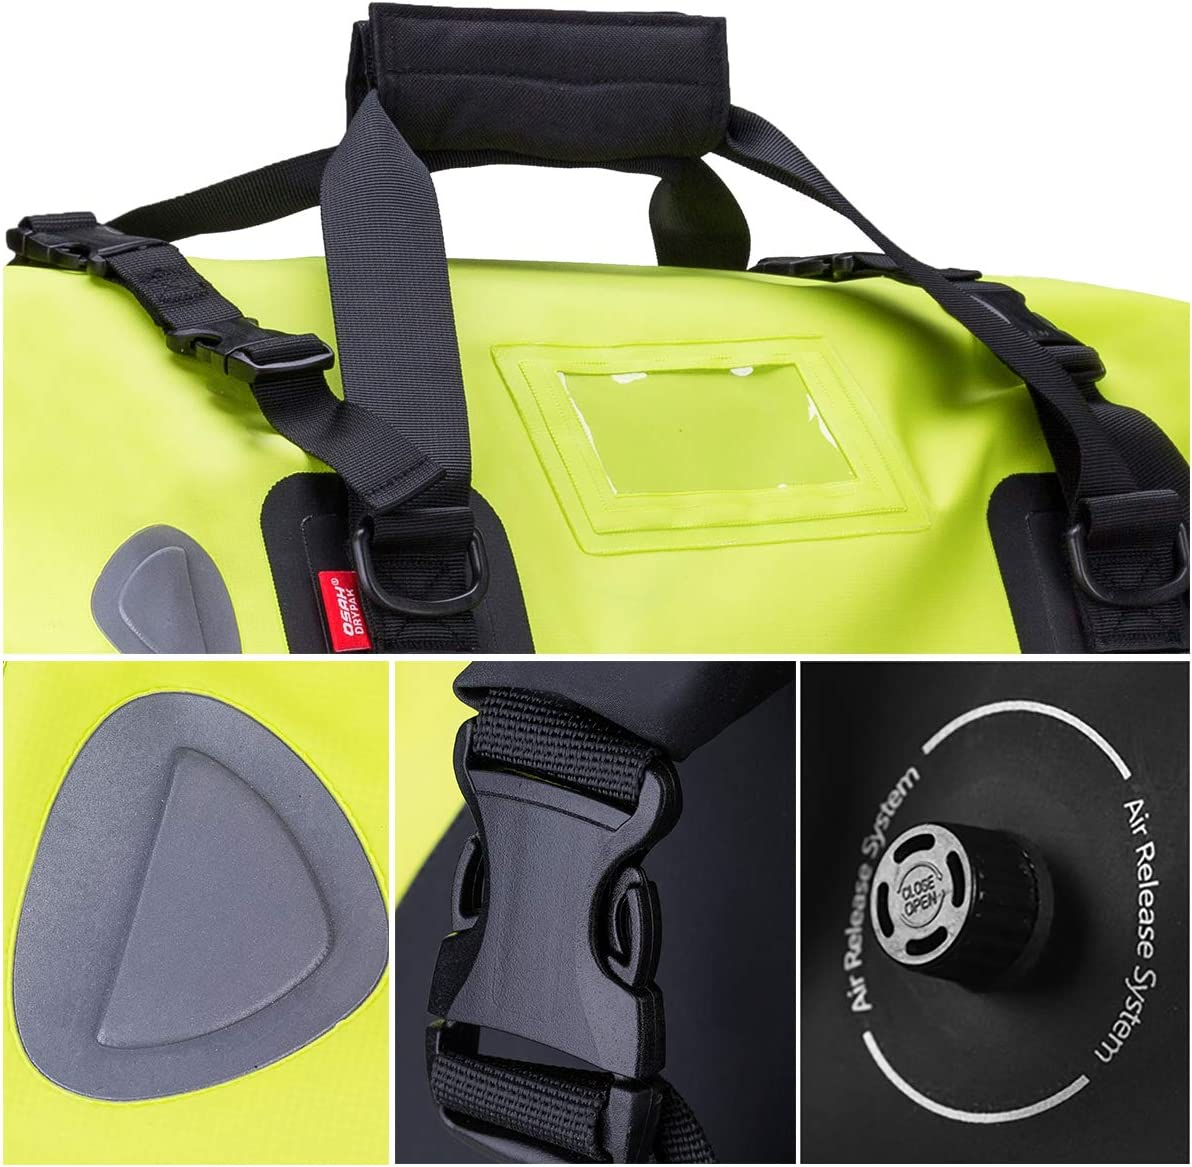 Motocicleta 500D PVC Impermeable Reflectante Cola Bolsa Silla Equipaje Accesorios al Aire Libre Verde 40L